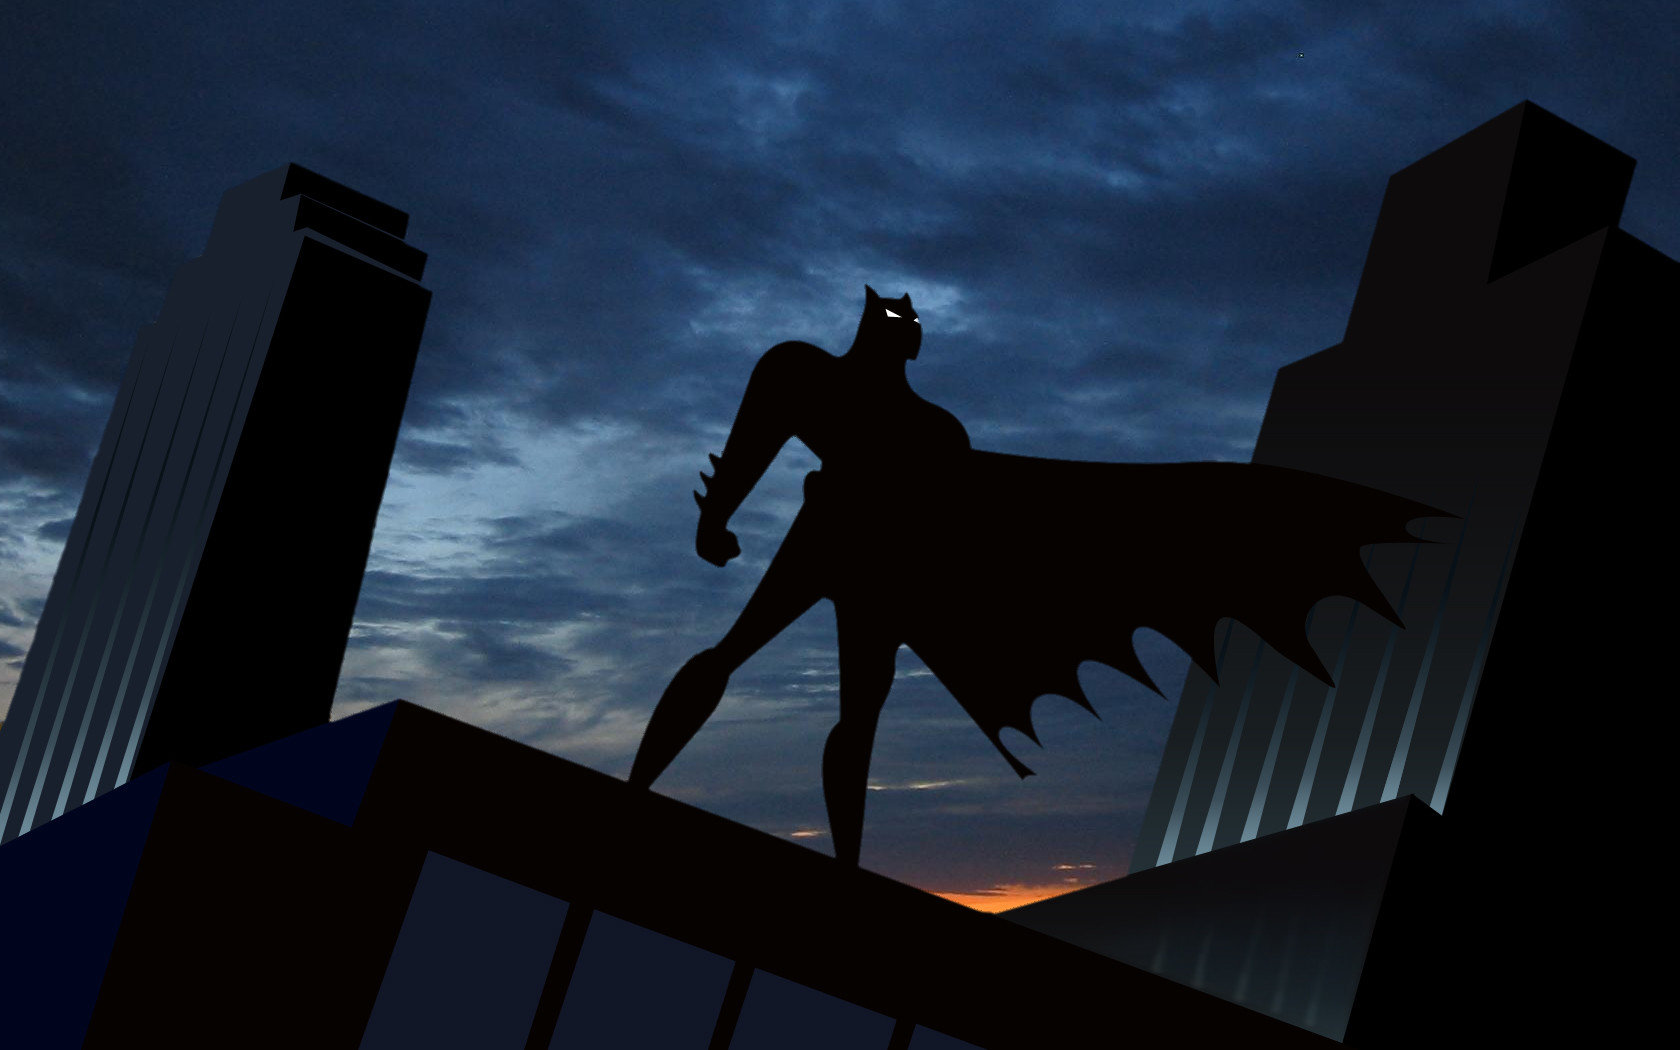 Batman The Animated Series Wallpapers 1680x1050 Desktop